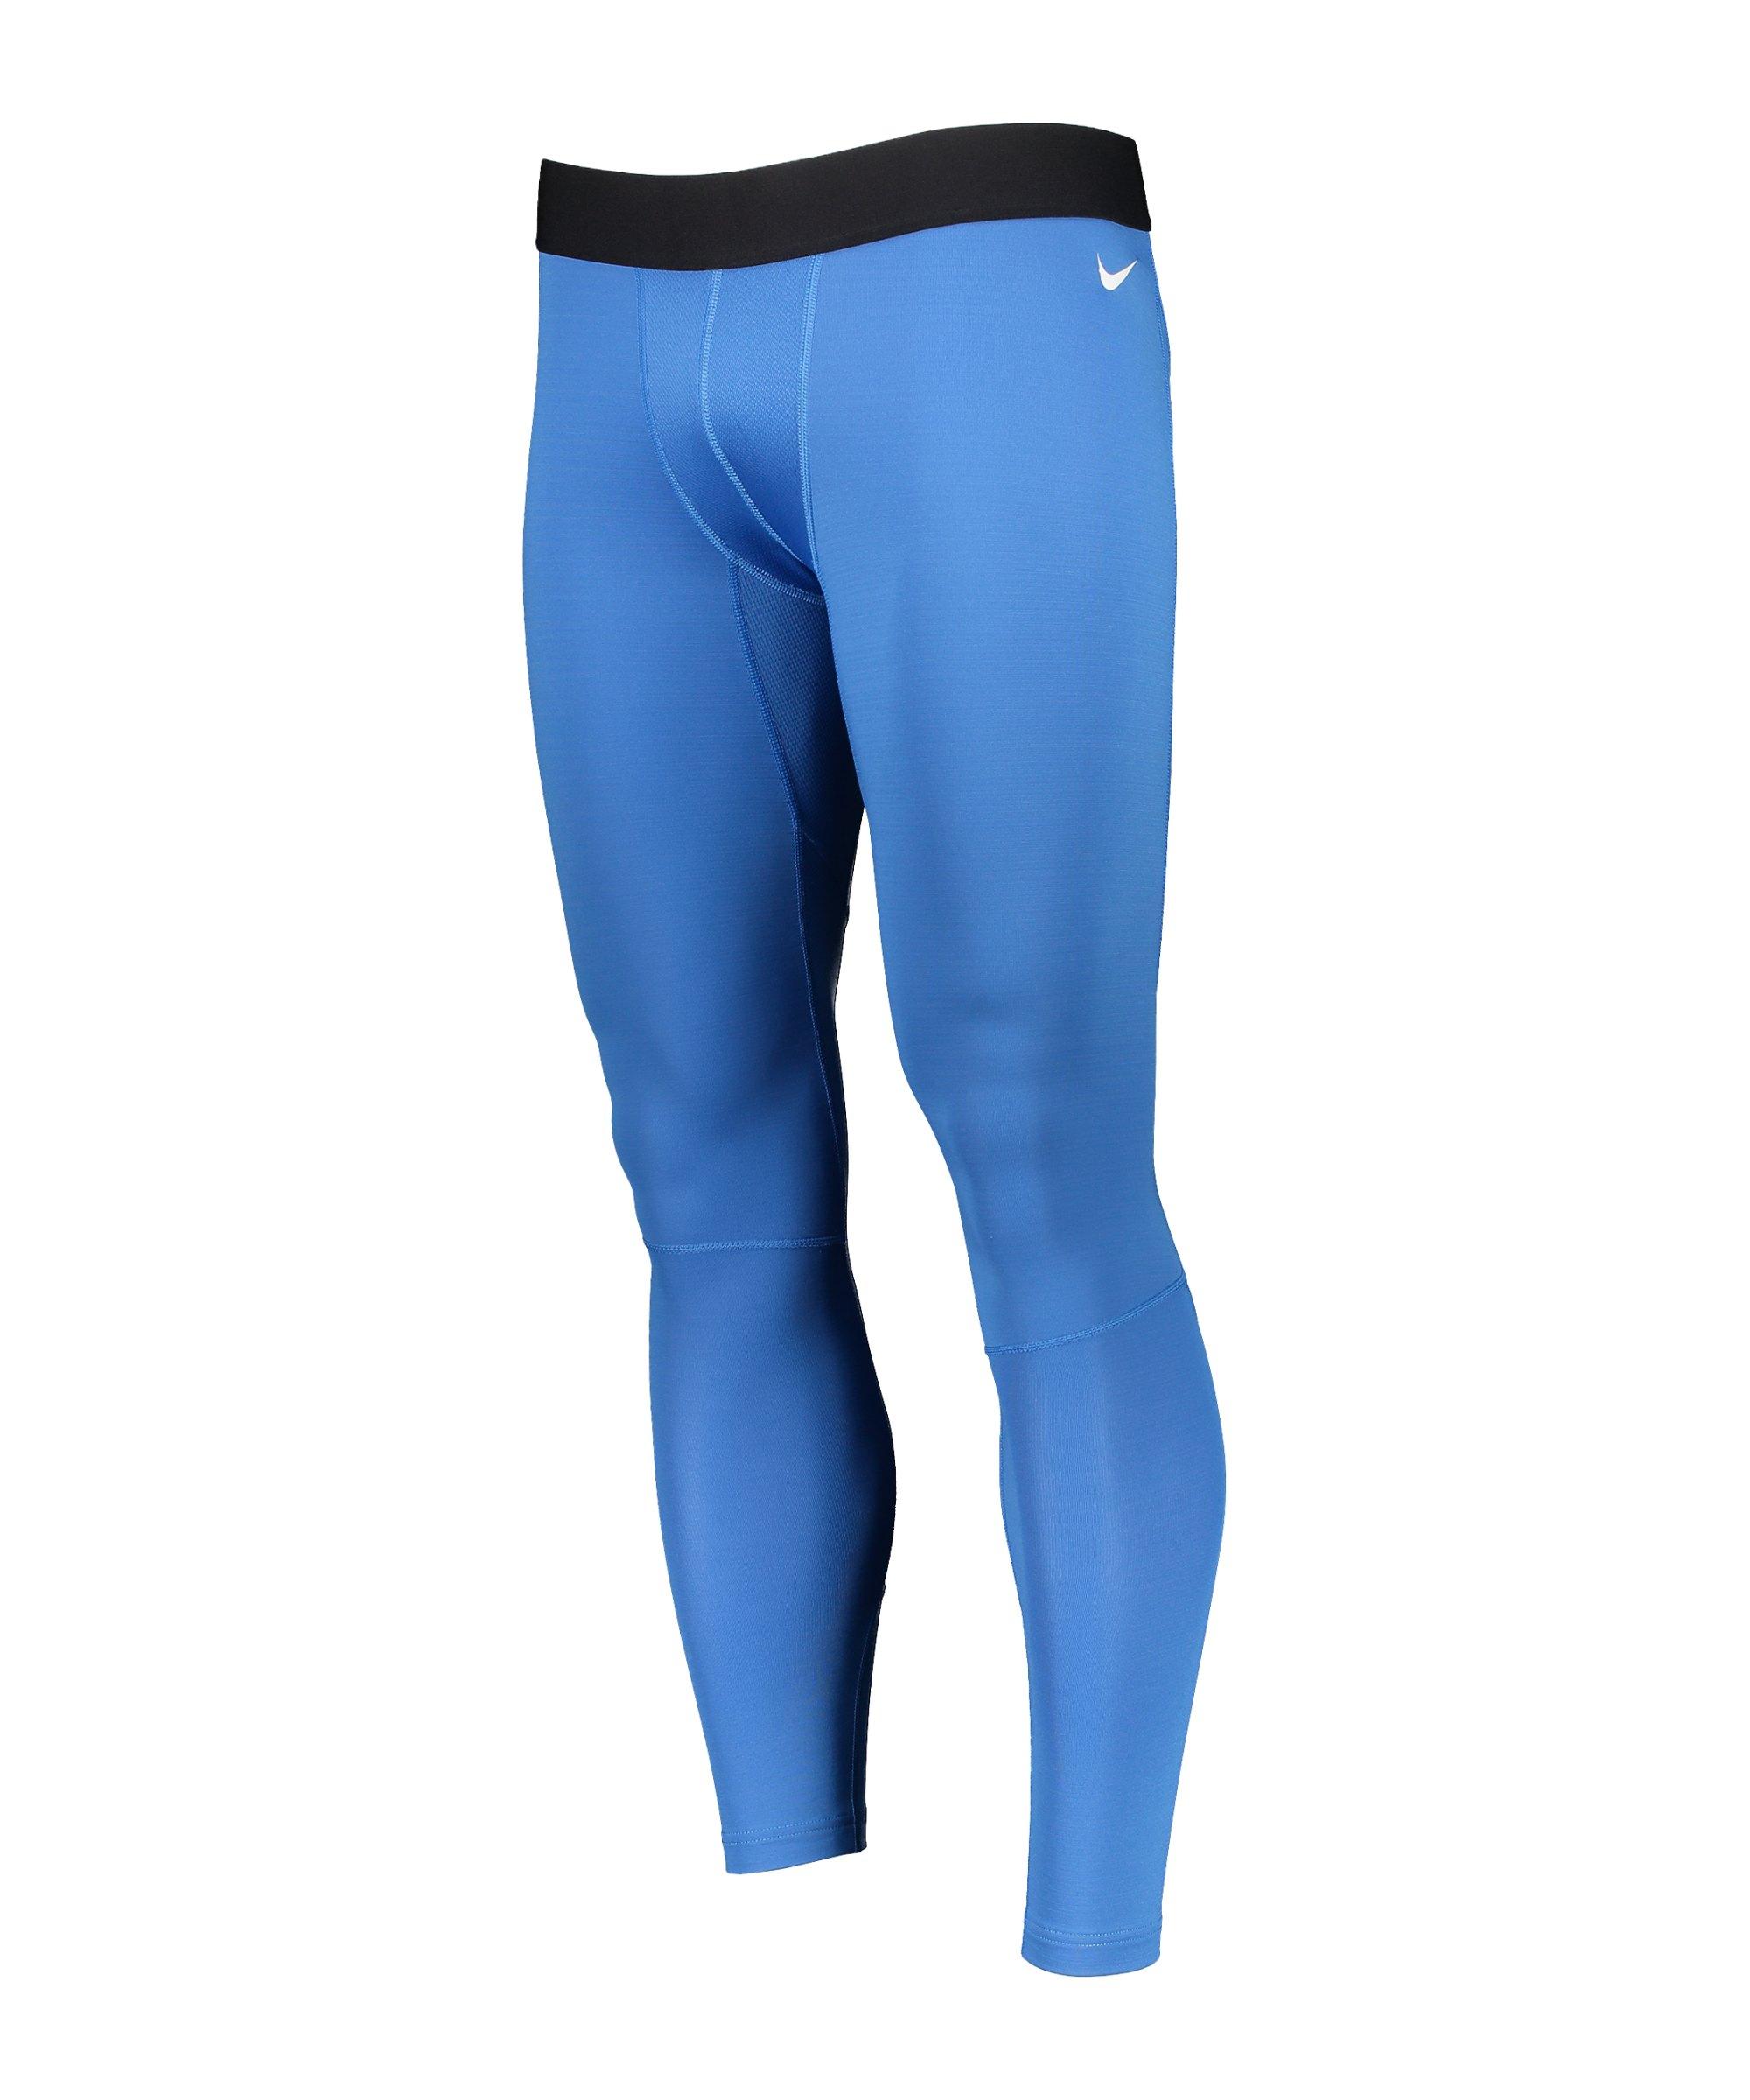 Nike NP Hyperwarm Max Tight Blau F465 - blau